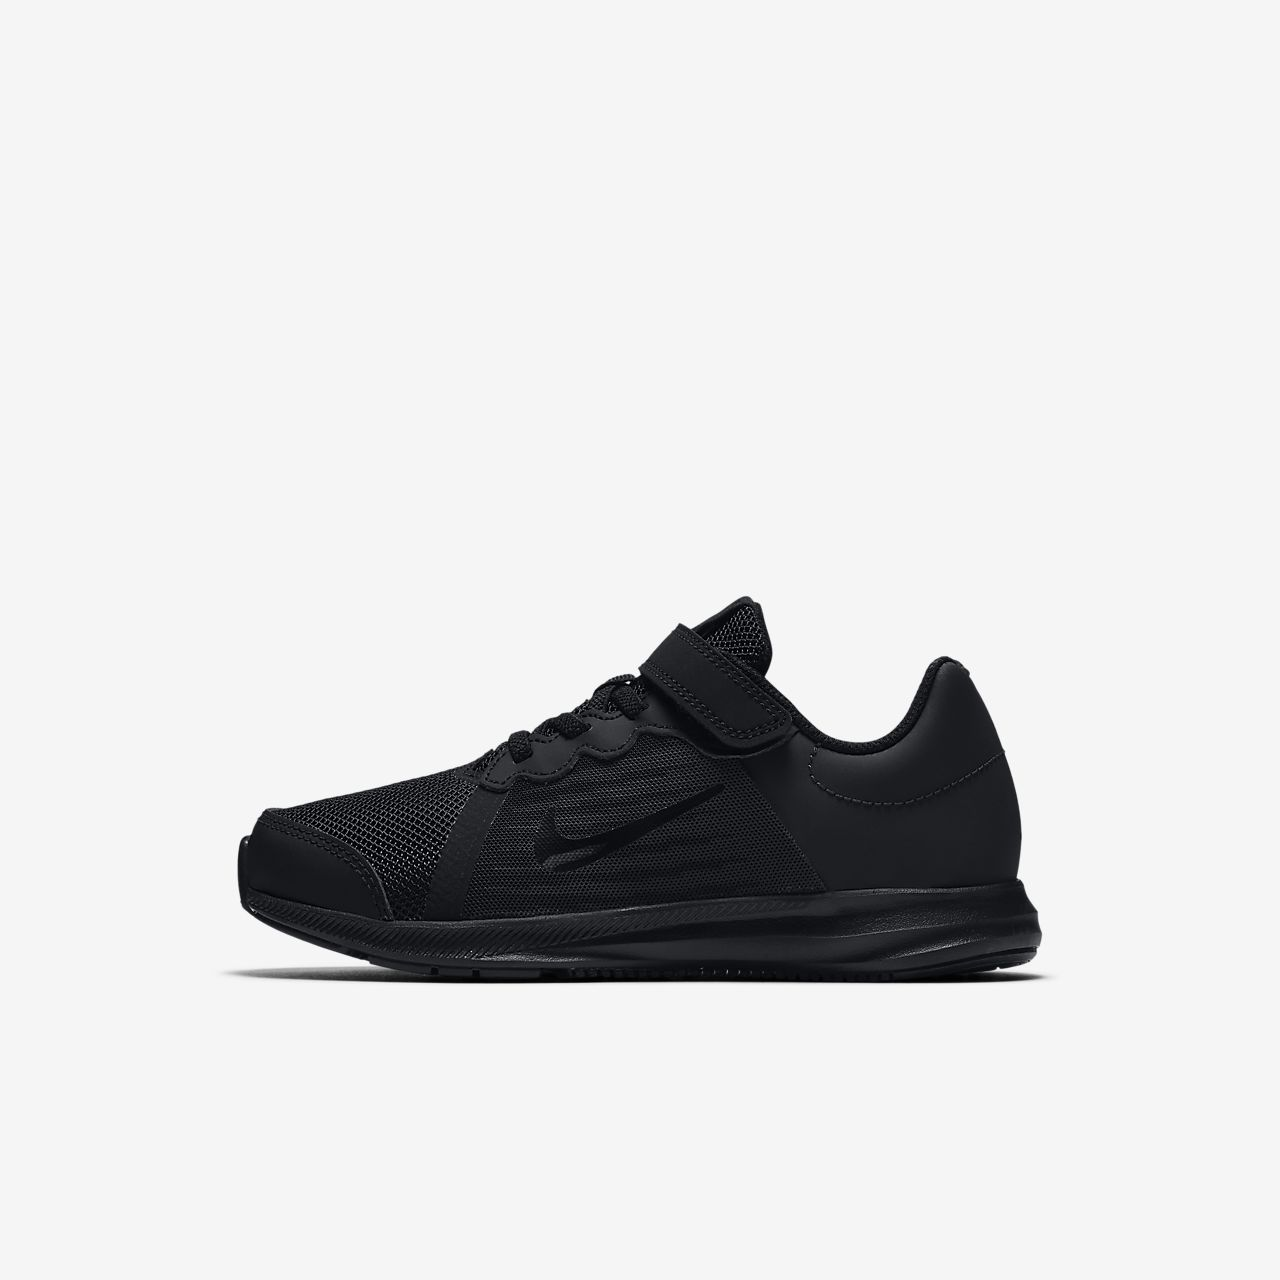 c6143fc0fc5 Nike Downshifter 8 Younger Kids  Shoe. Nike.com GB